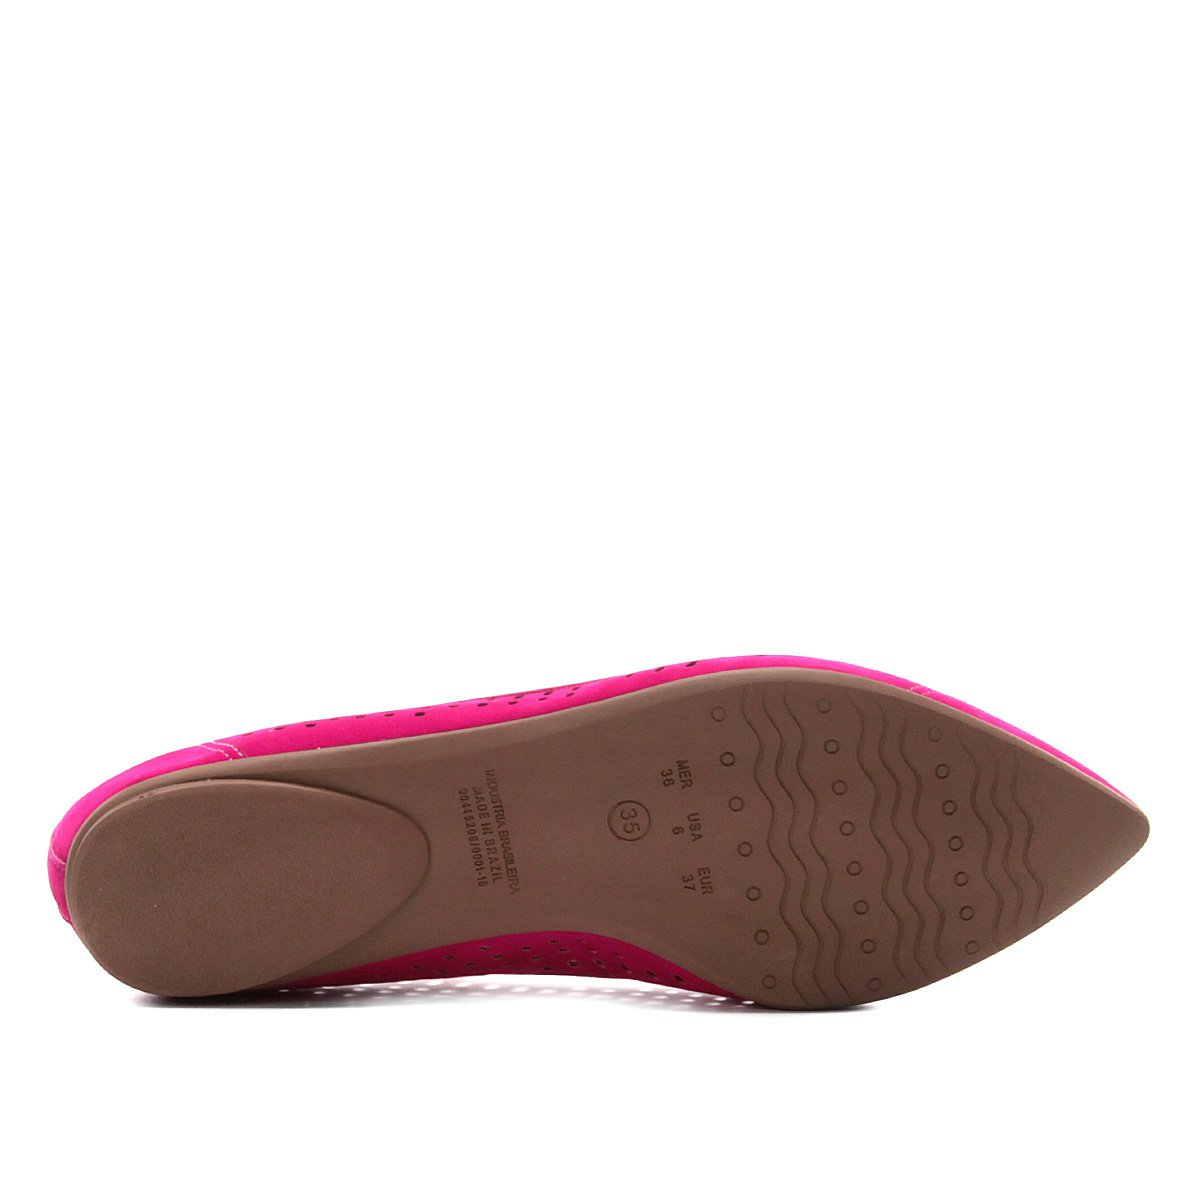 Fino Fino Laser Pink Pink Sapatilha Feminina Feminina Sapatilha Bebecê Bebecê Sapatilha Bico Bico Laser APqfXTPv